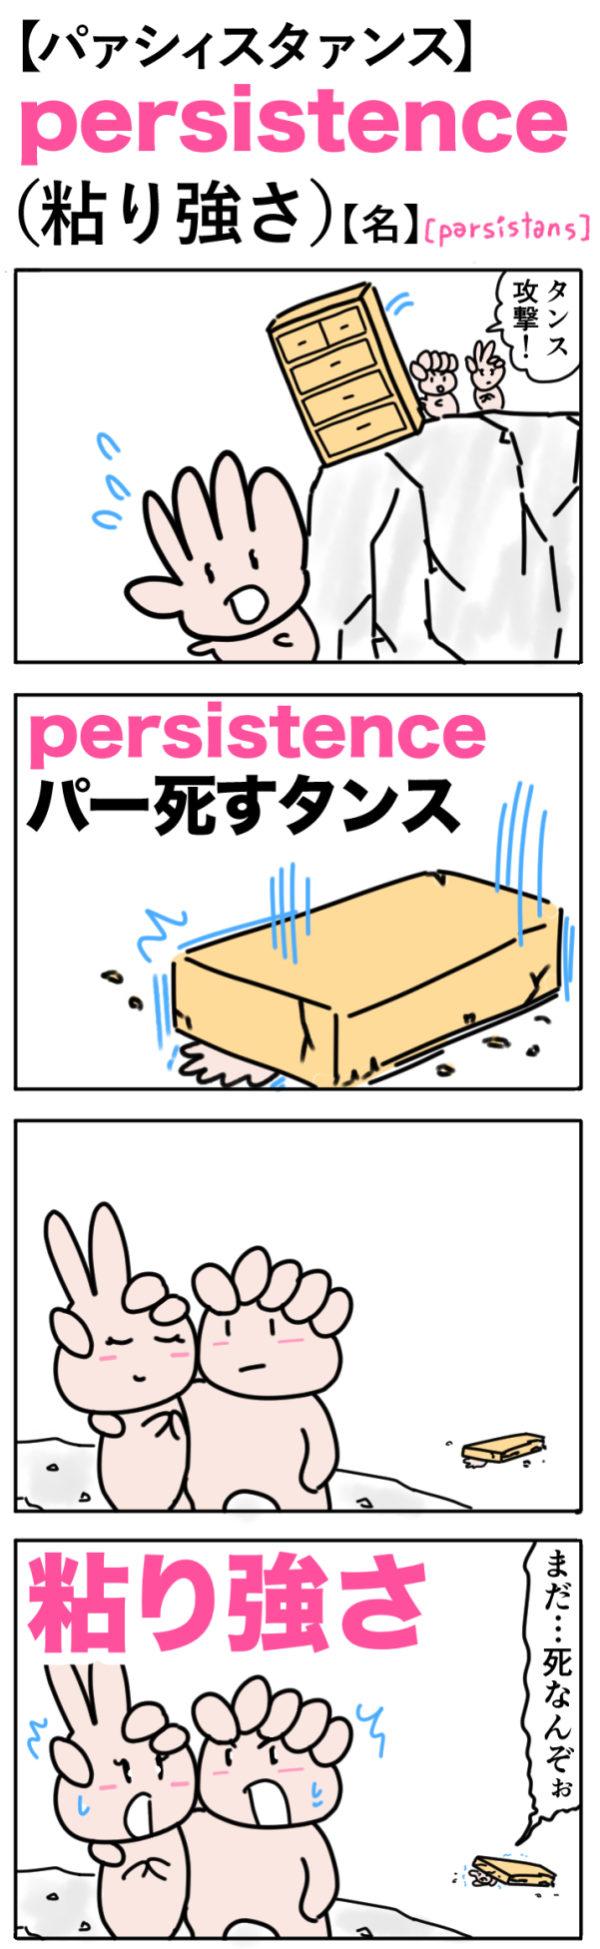 persistence(粘り強さ)の語呂合わせ英単語